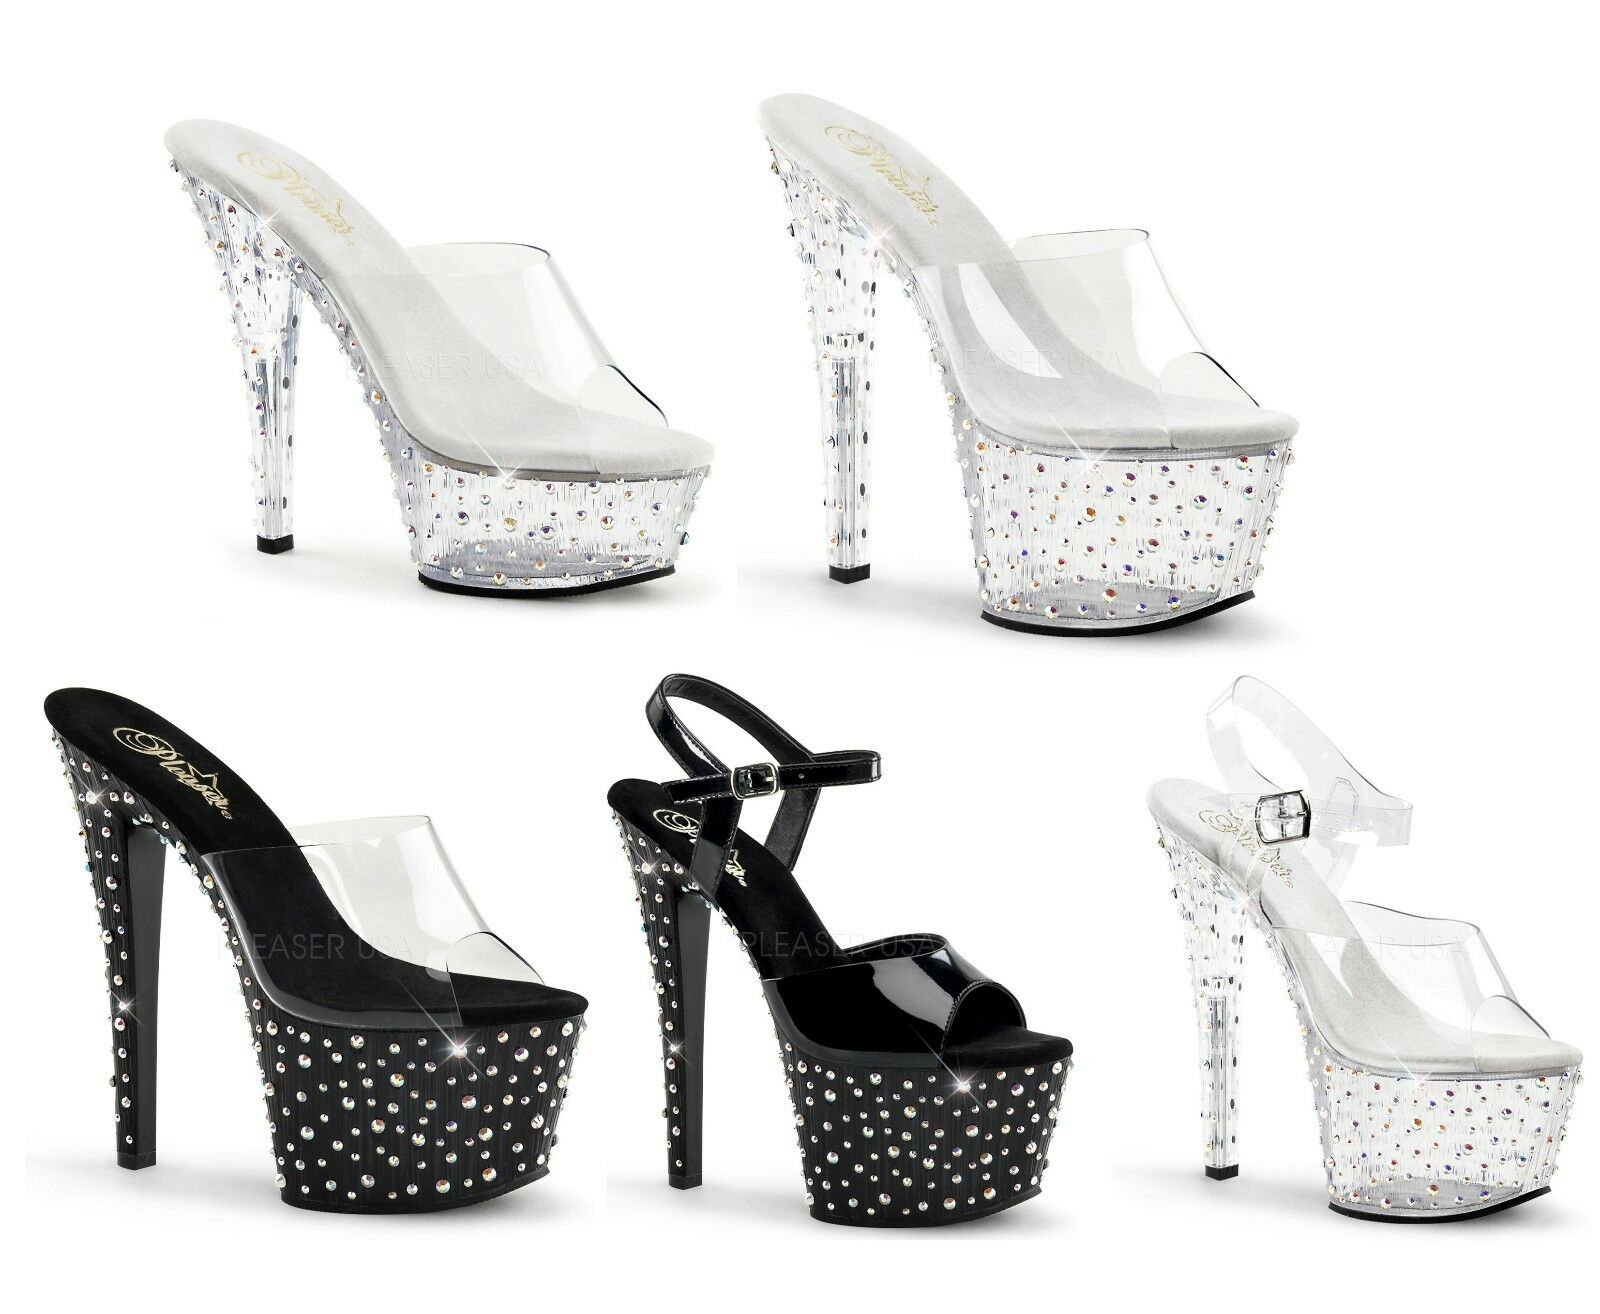 STARDANCE-601 701 708 709 PLEASER Sexy 6-7  Heel Platform Slide and Sandal